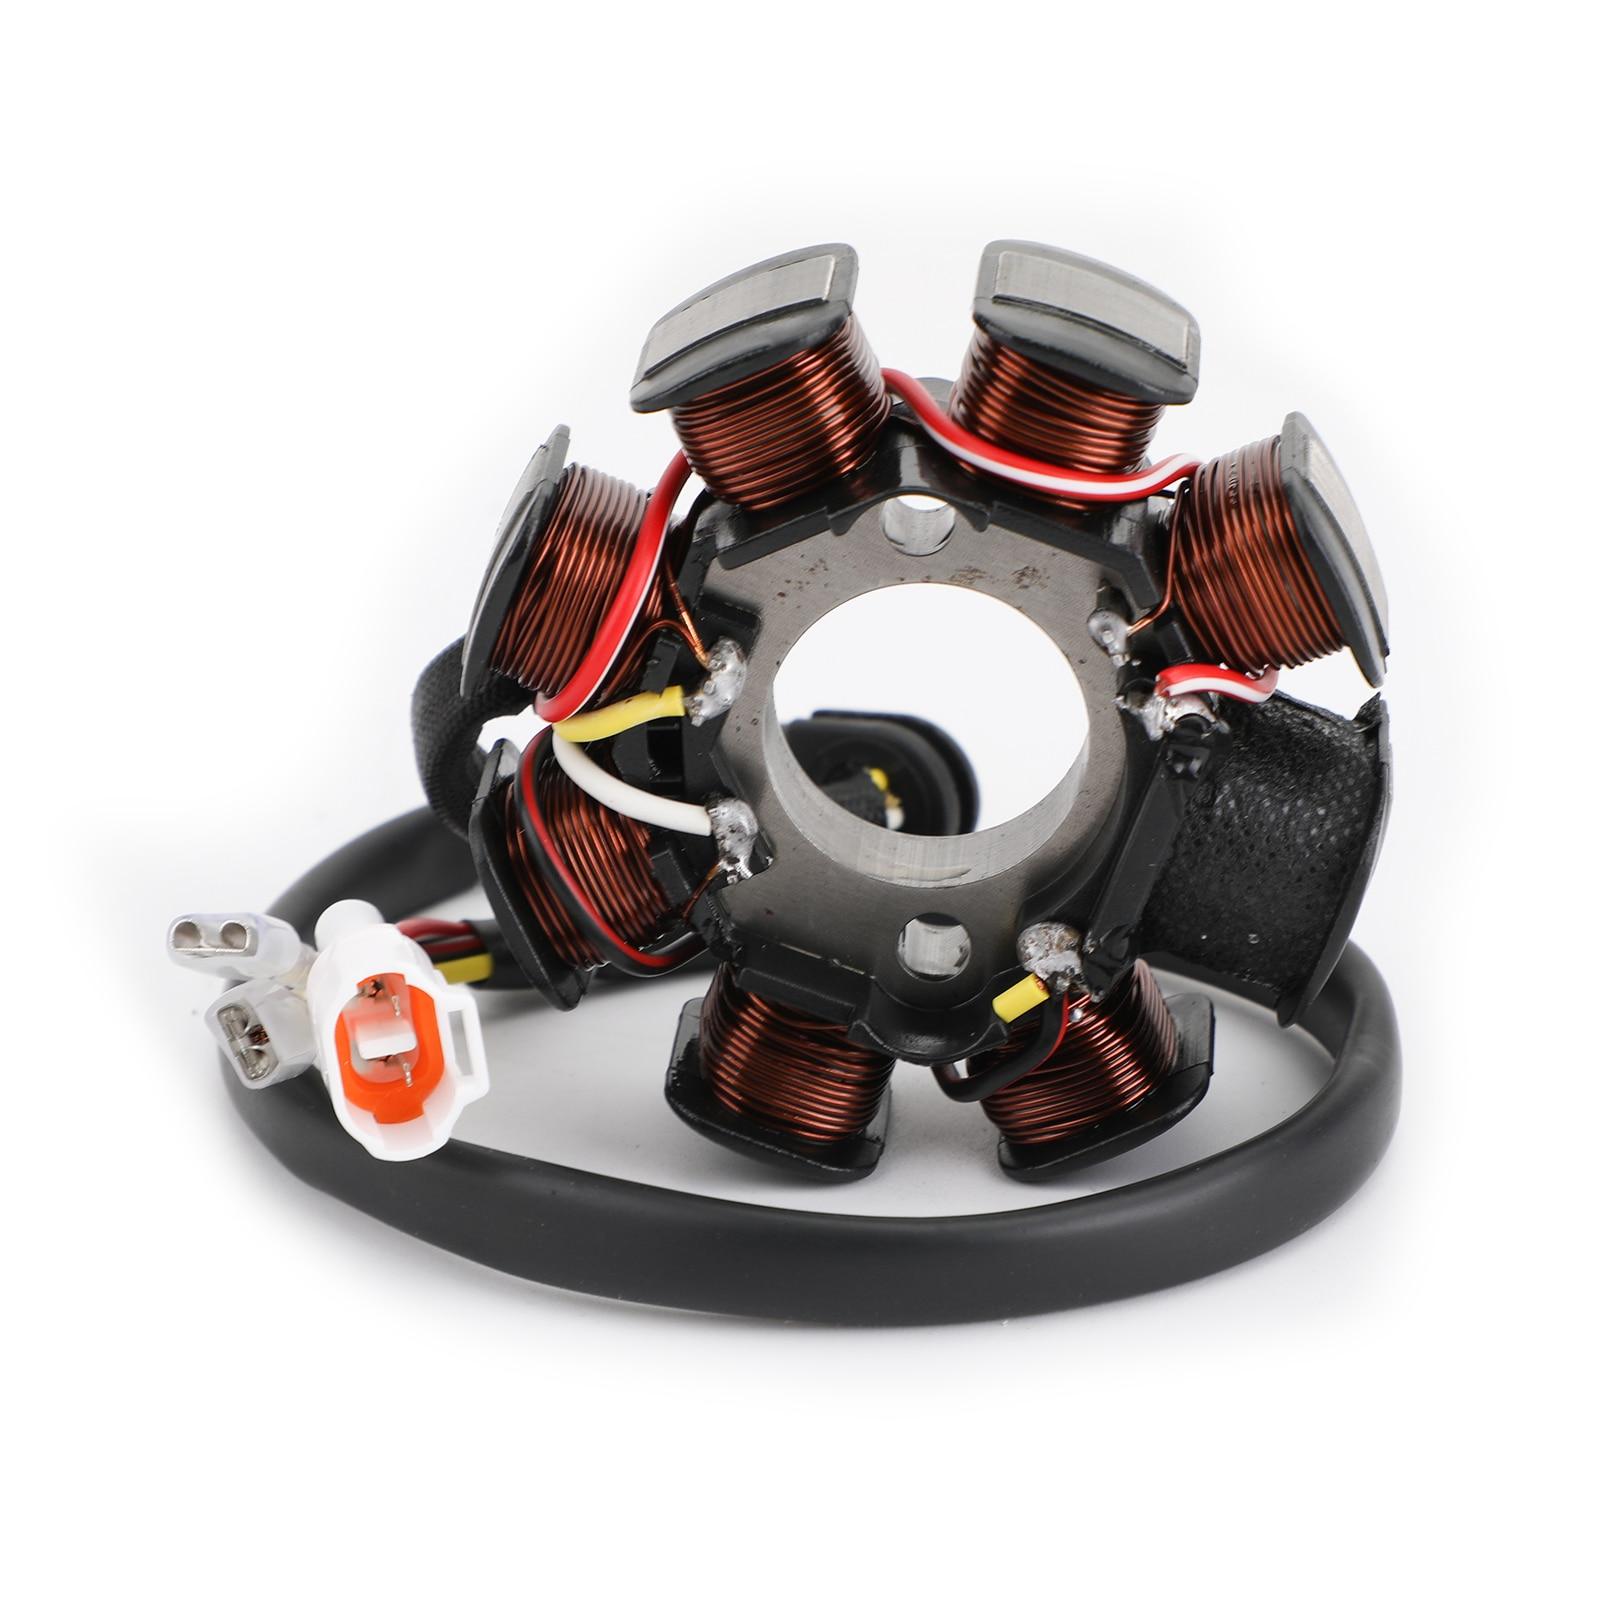 KTM EXC 520 Racing Best Quality Alternator Cover Gasket 2001